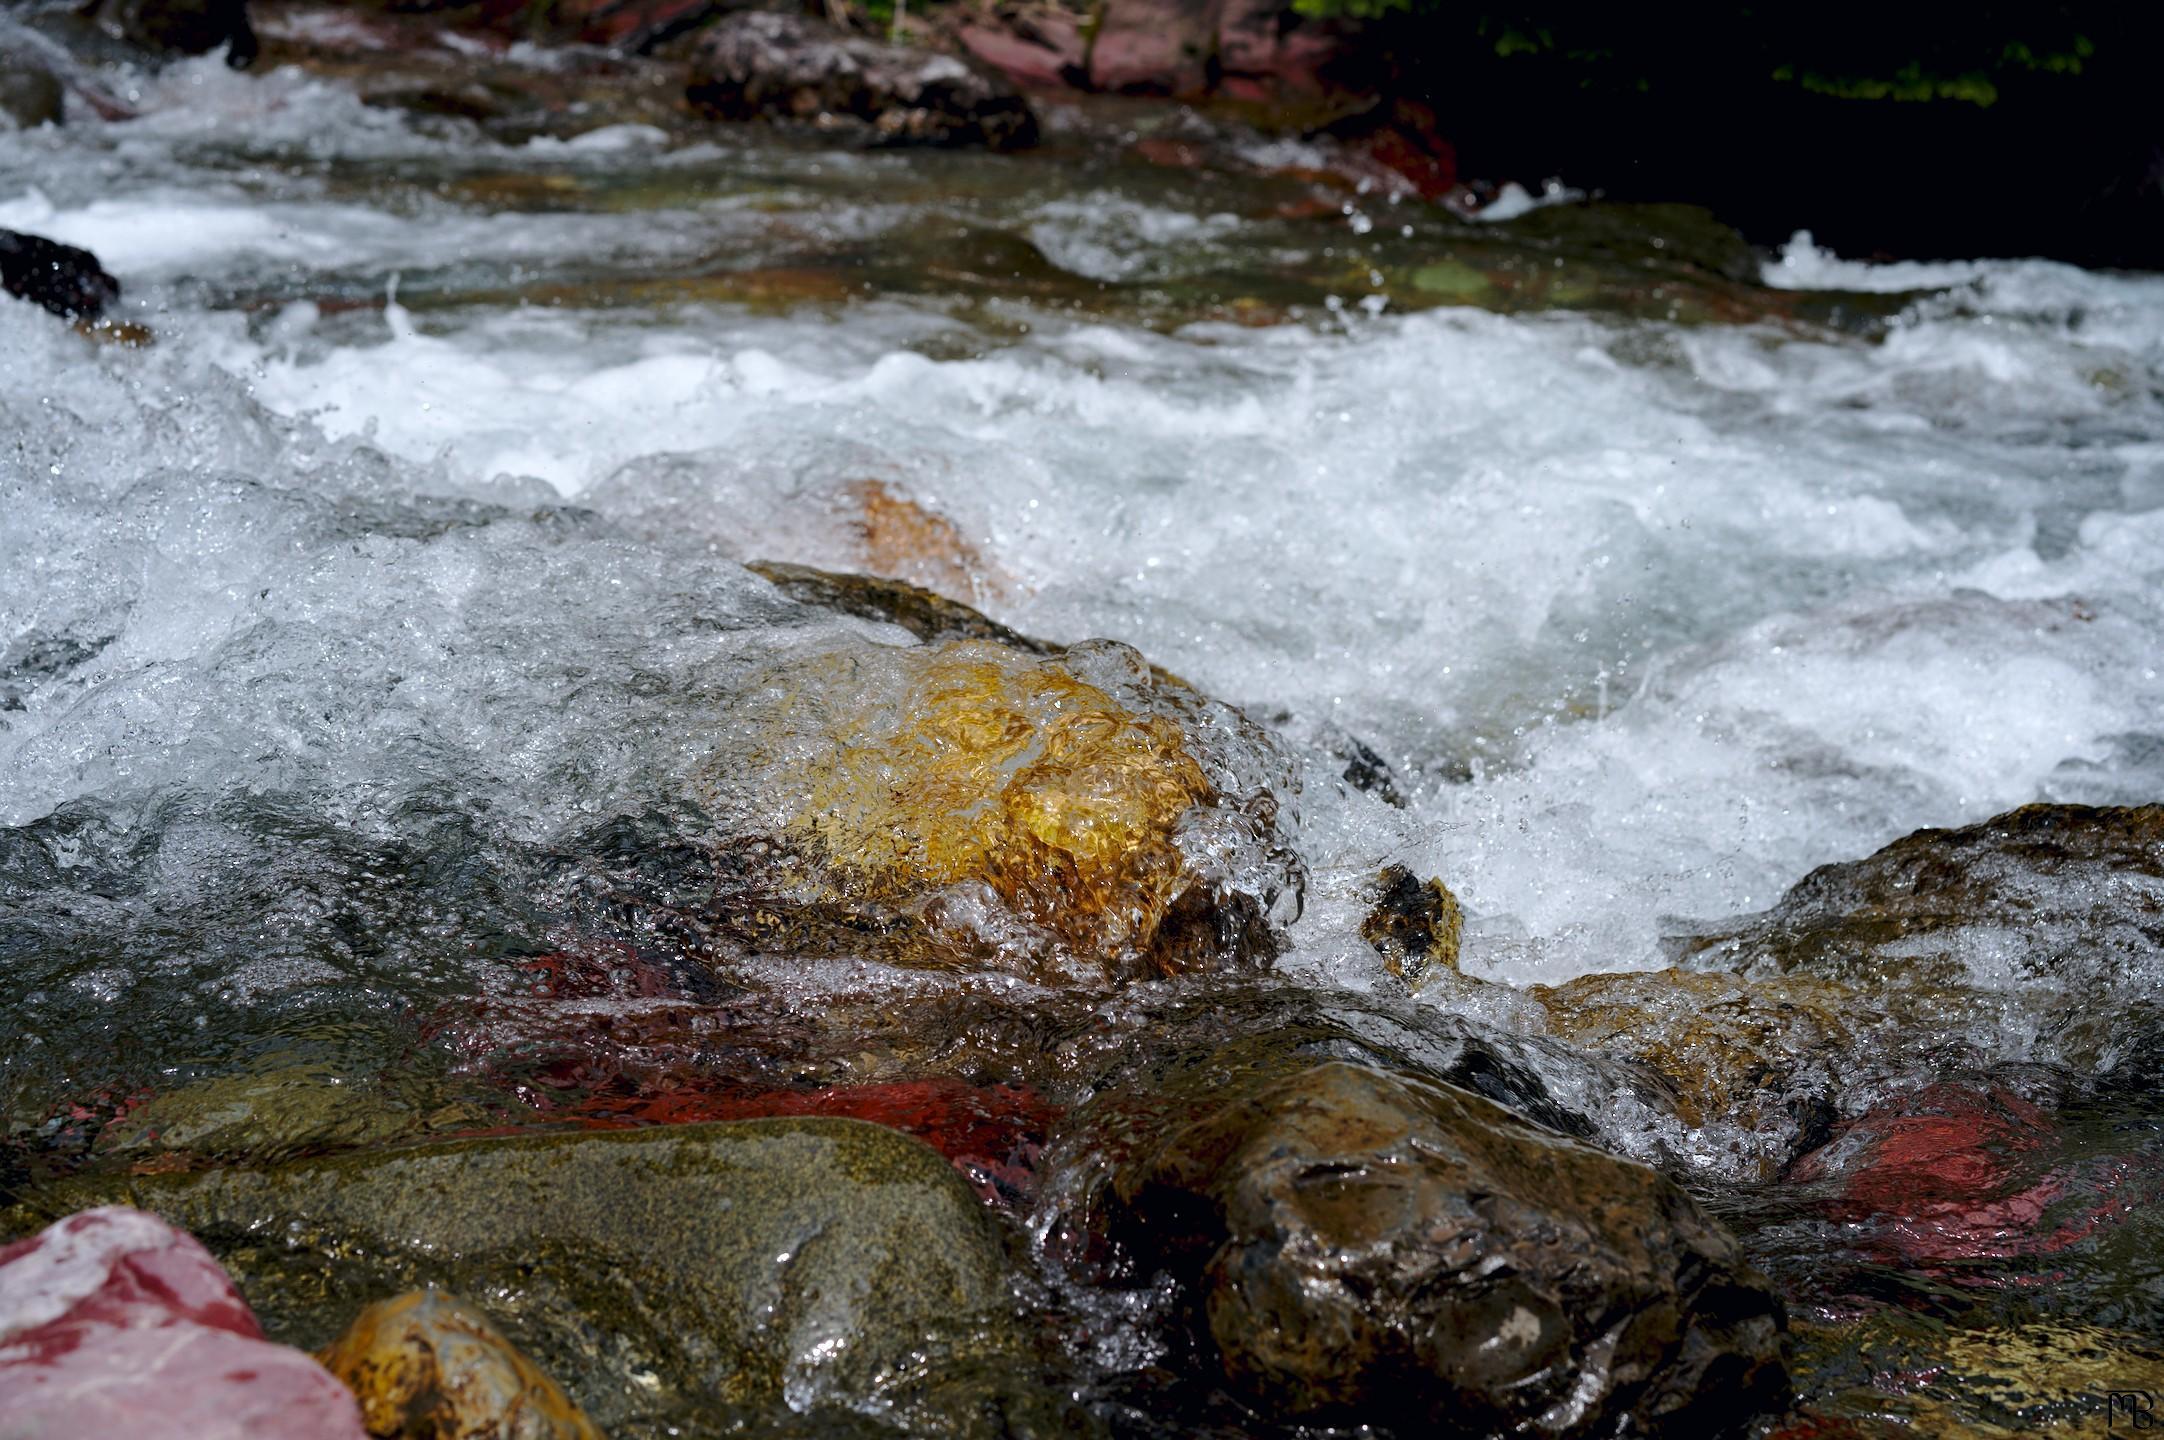 Water rushing over orange-y rock